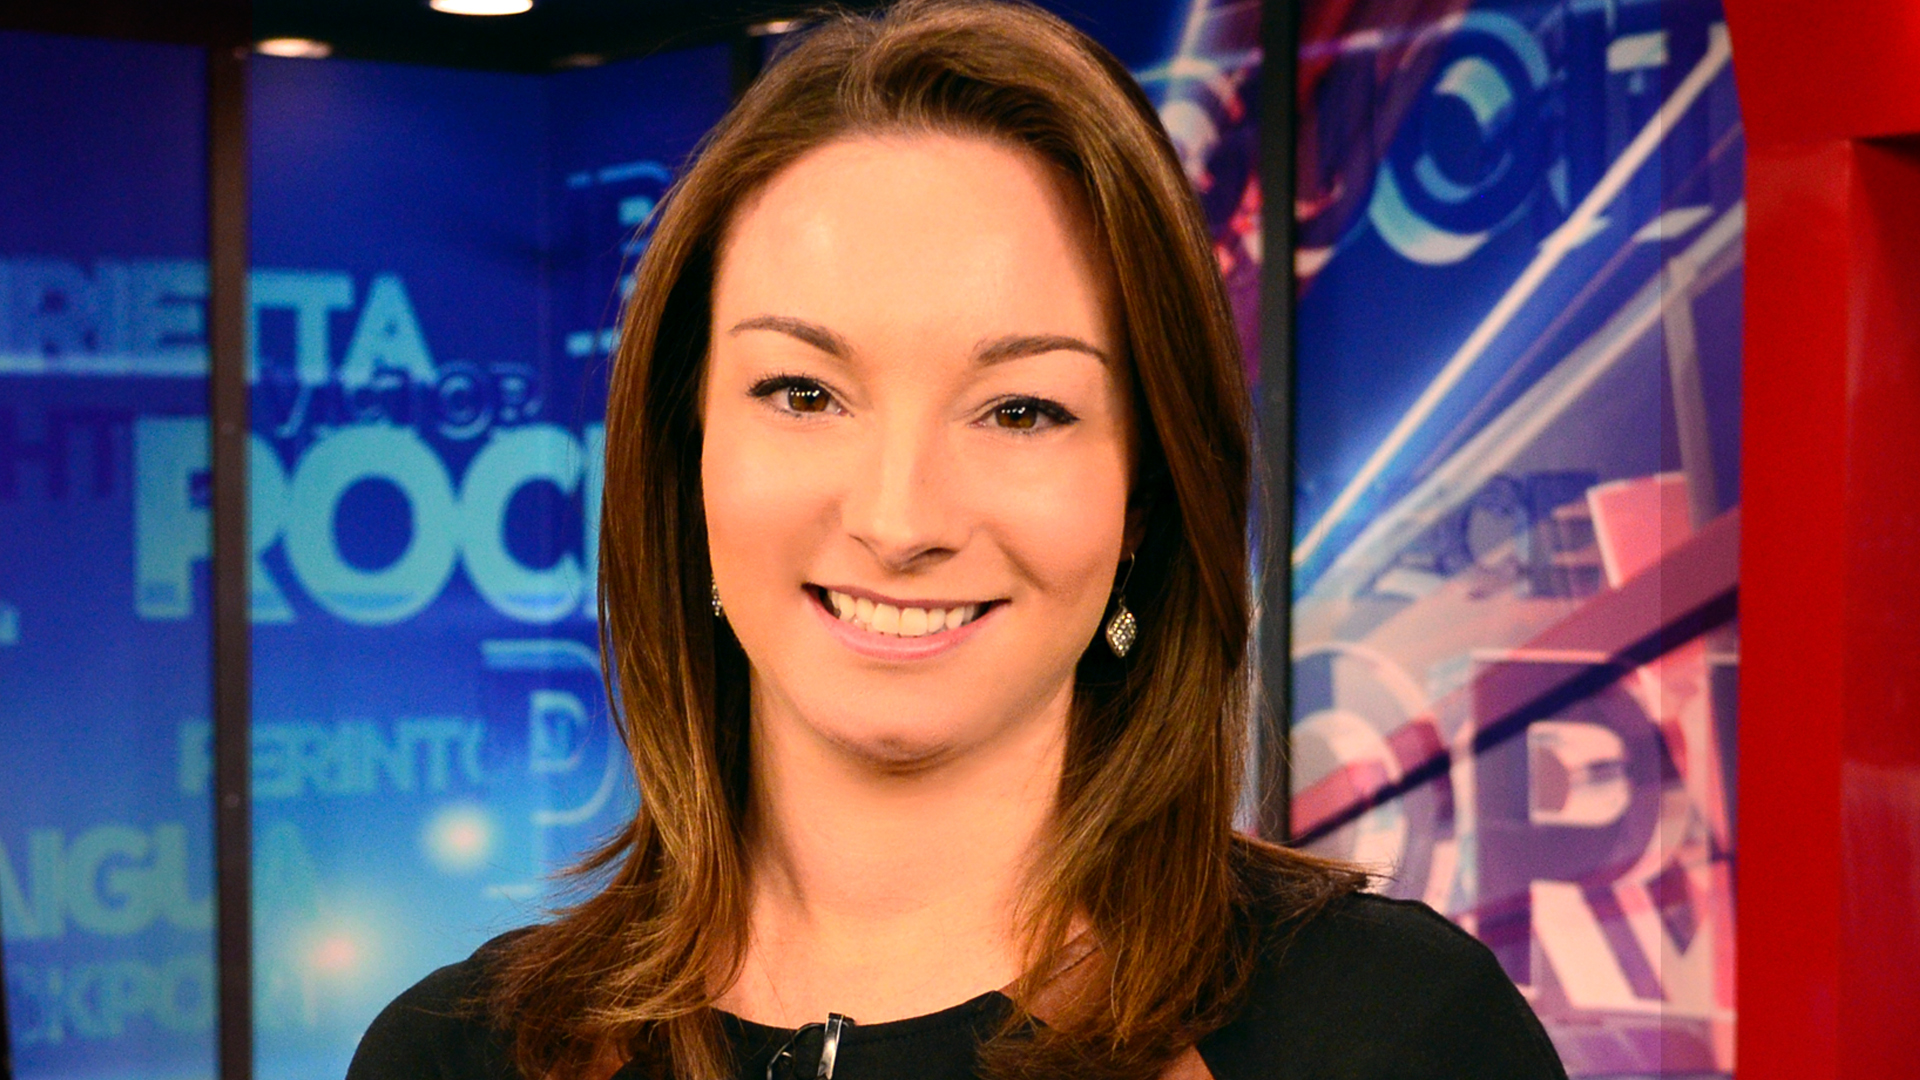 Chief meteorologist Stacey Pensgen announces she's leaving WROC-TV Channel 8